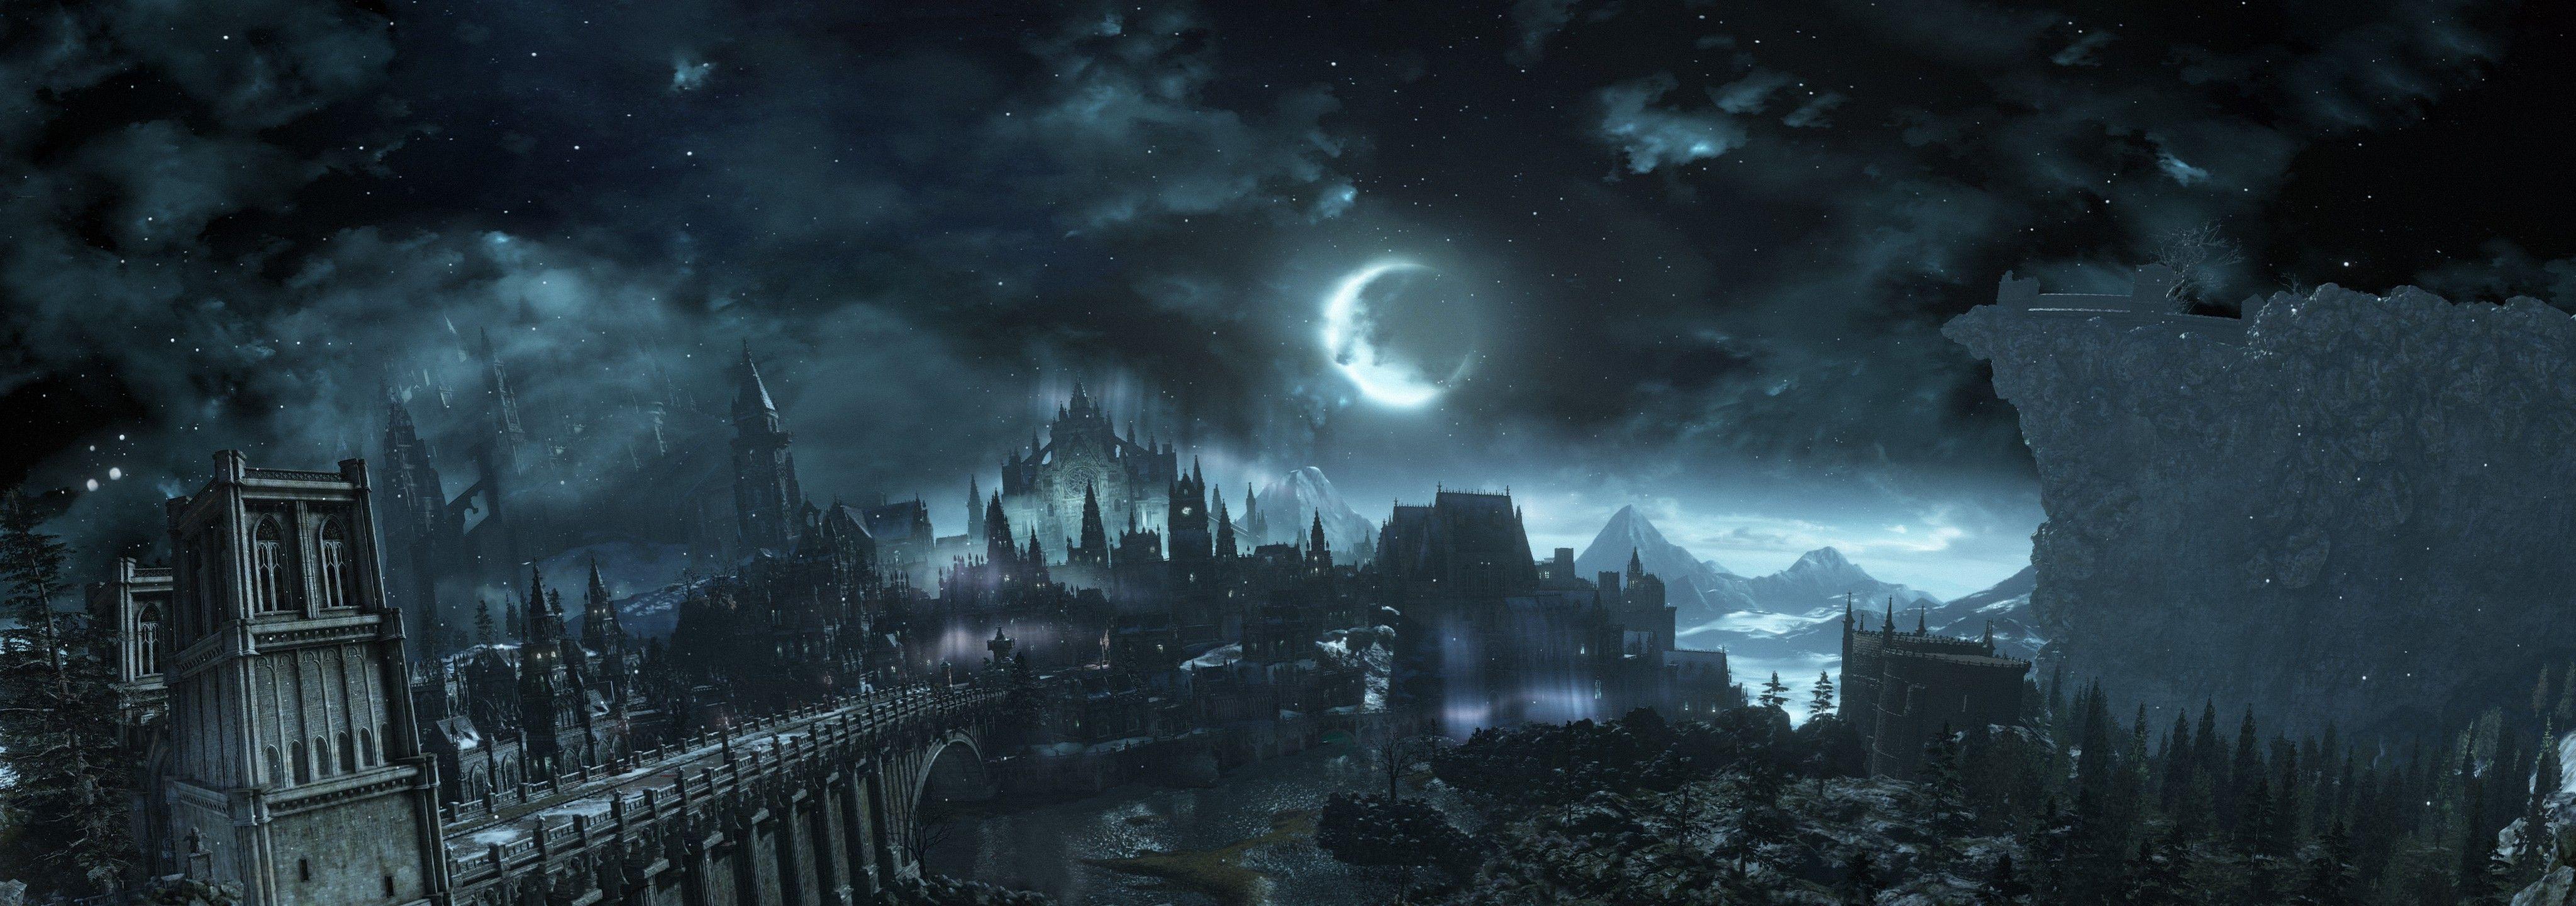 Dark Souls Hd 2021 Live Wallpaper Hd Dark Souls Digital Wallpaper Dark Fantasy Dark souls dual monitor wallpaper